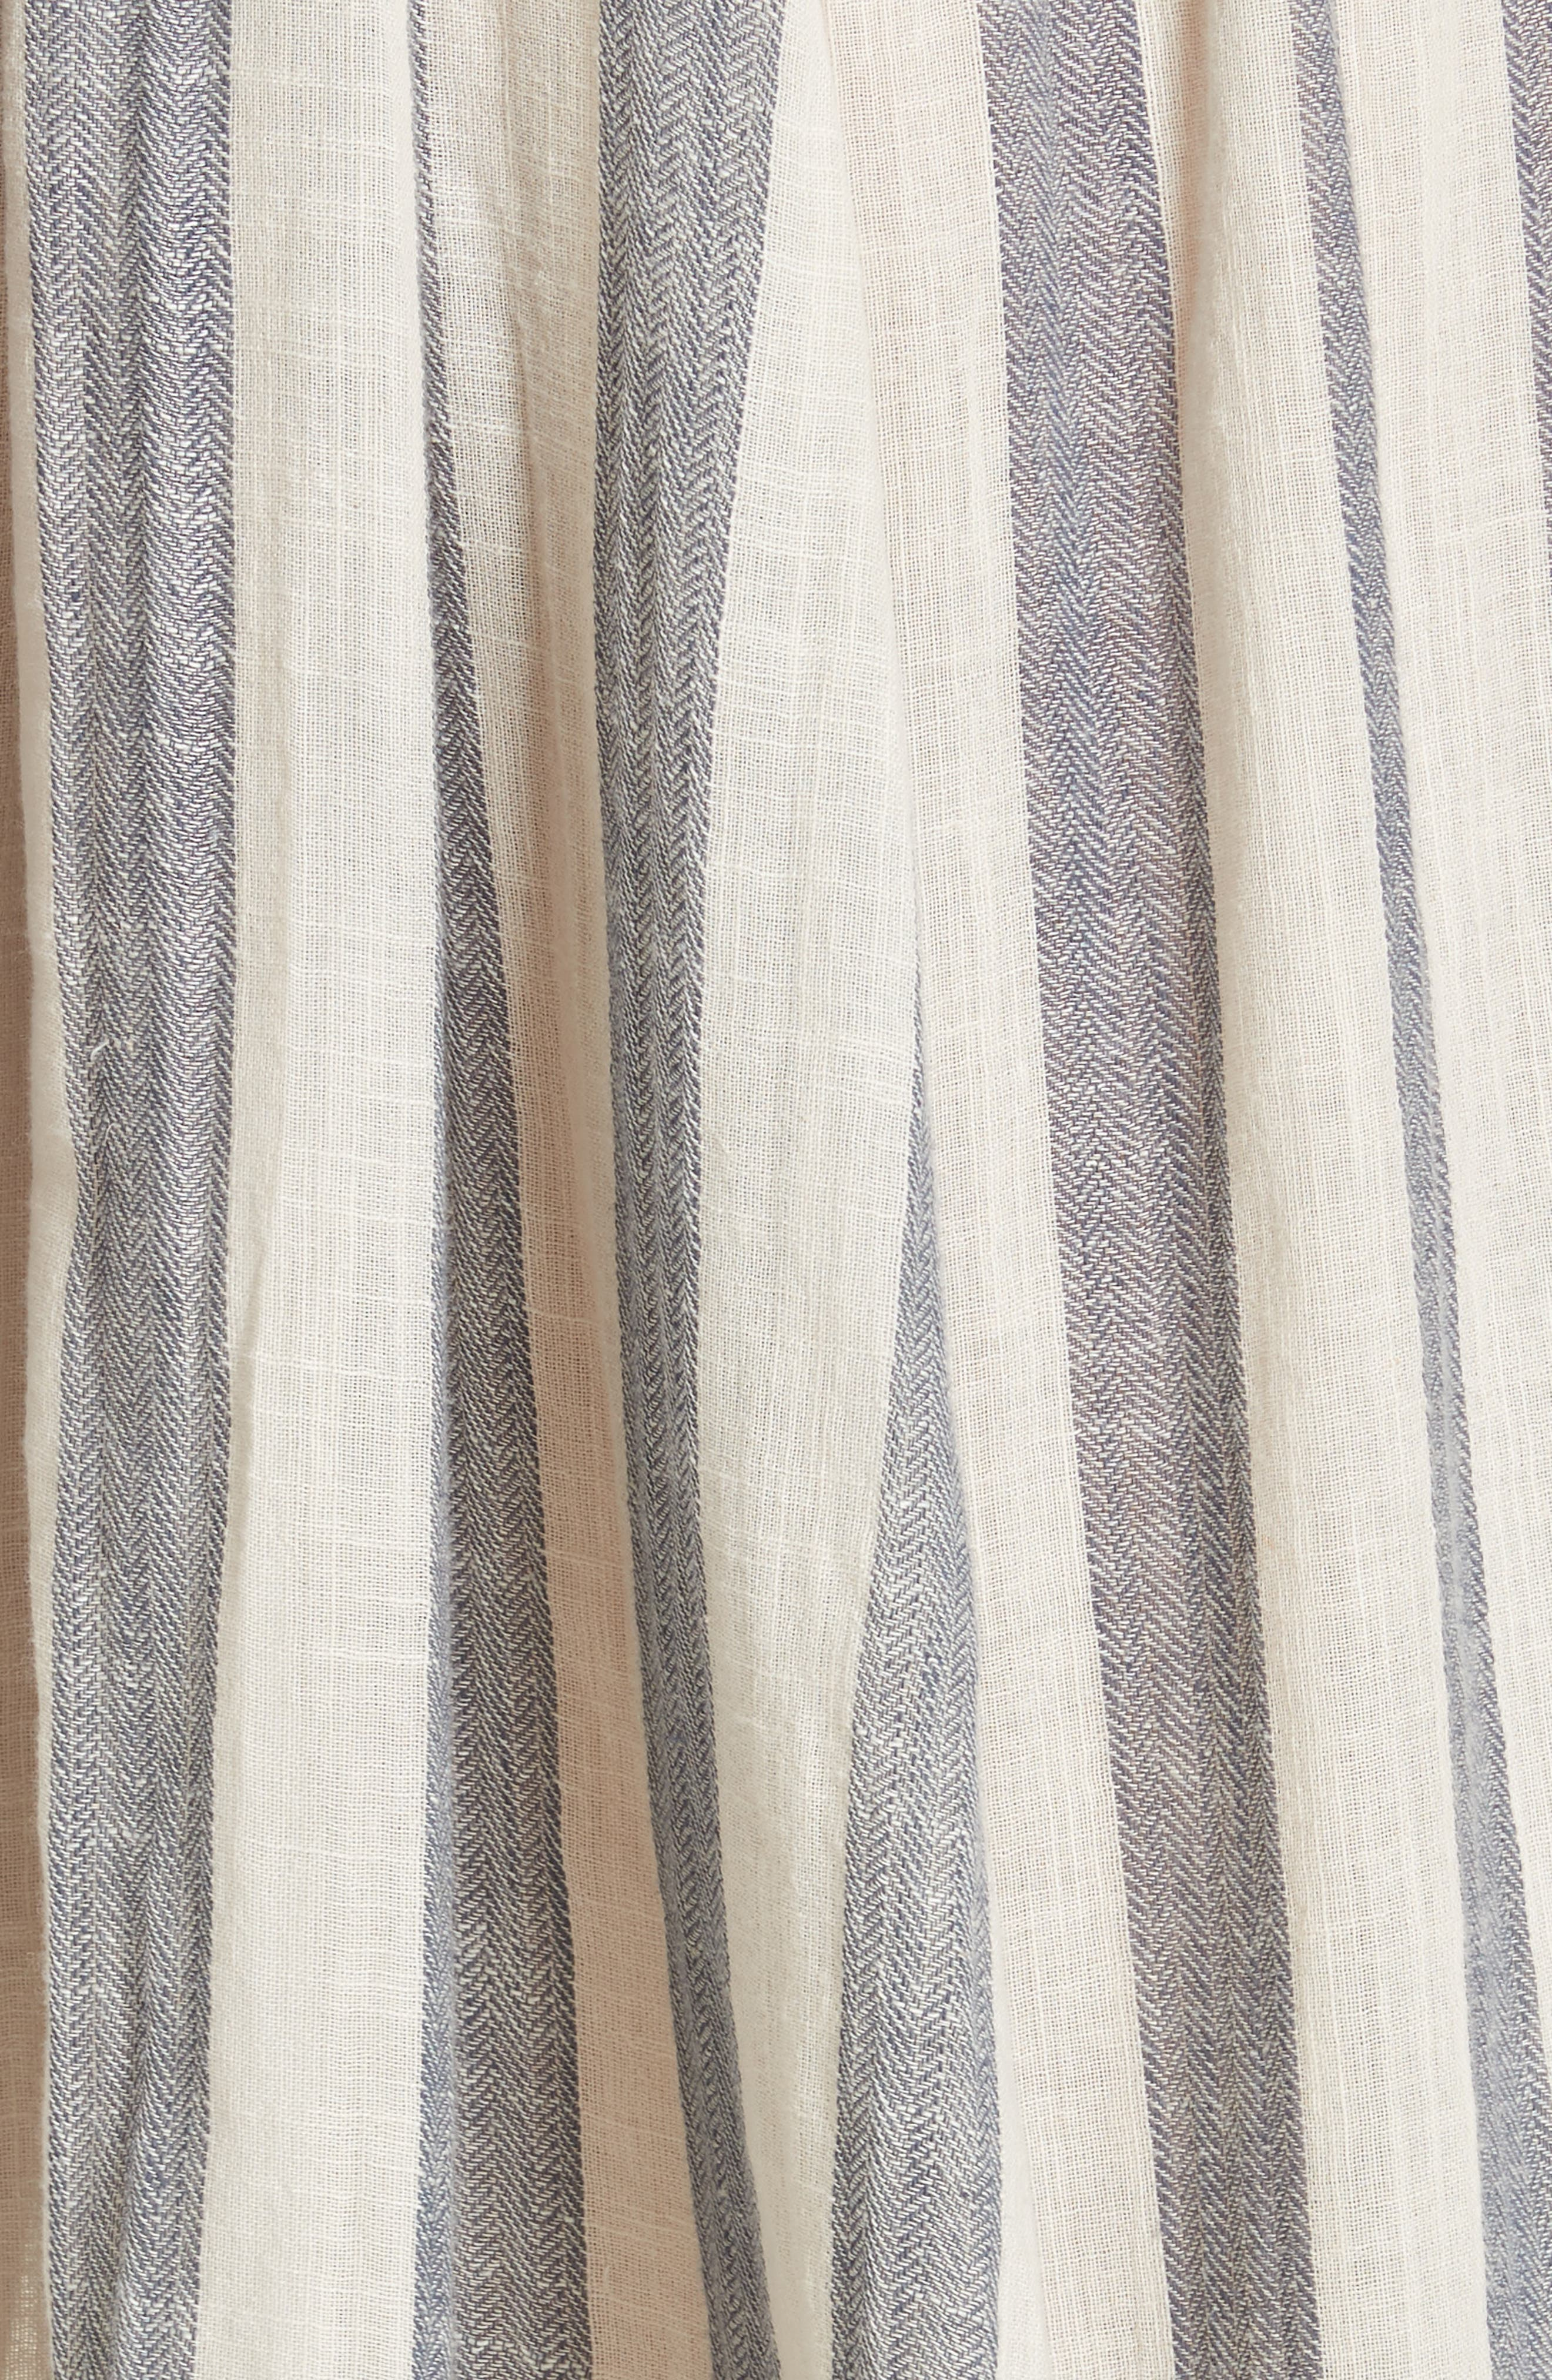 Stripe Me Up Strapless Midi Dress,                             Alternate thumbnail 5, color,                             400